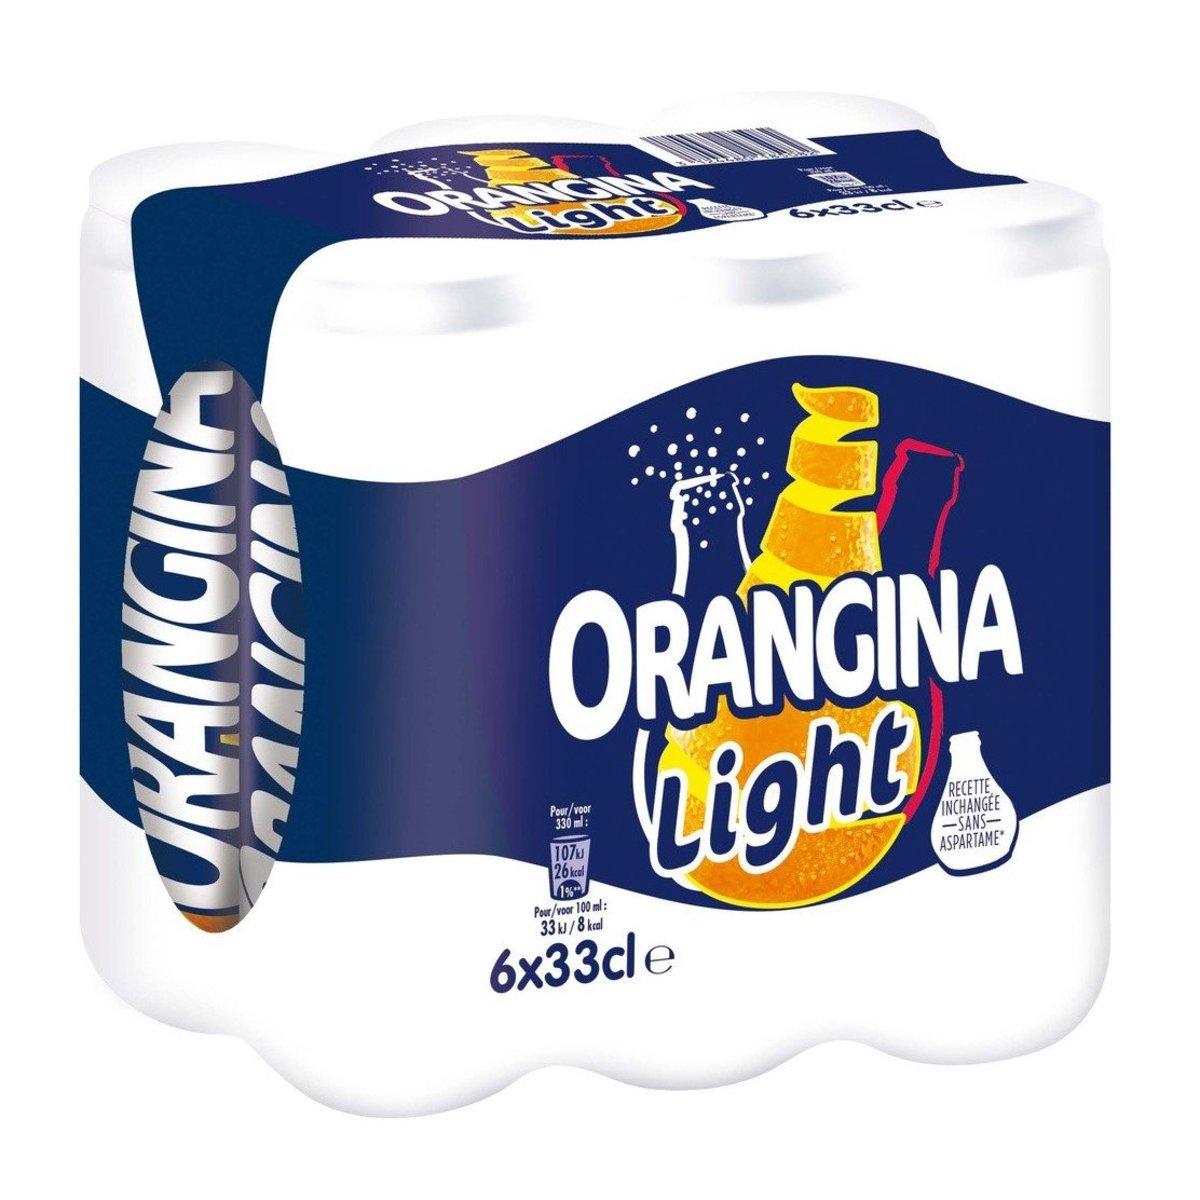 ORANGINA - Sugar Free  Sparkling Orange Juice - 6x330ml